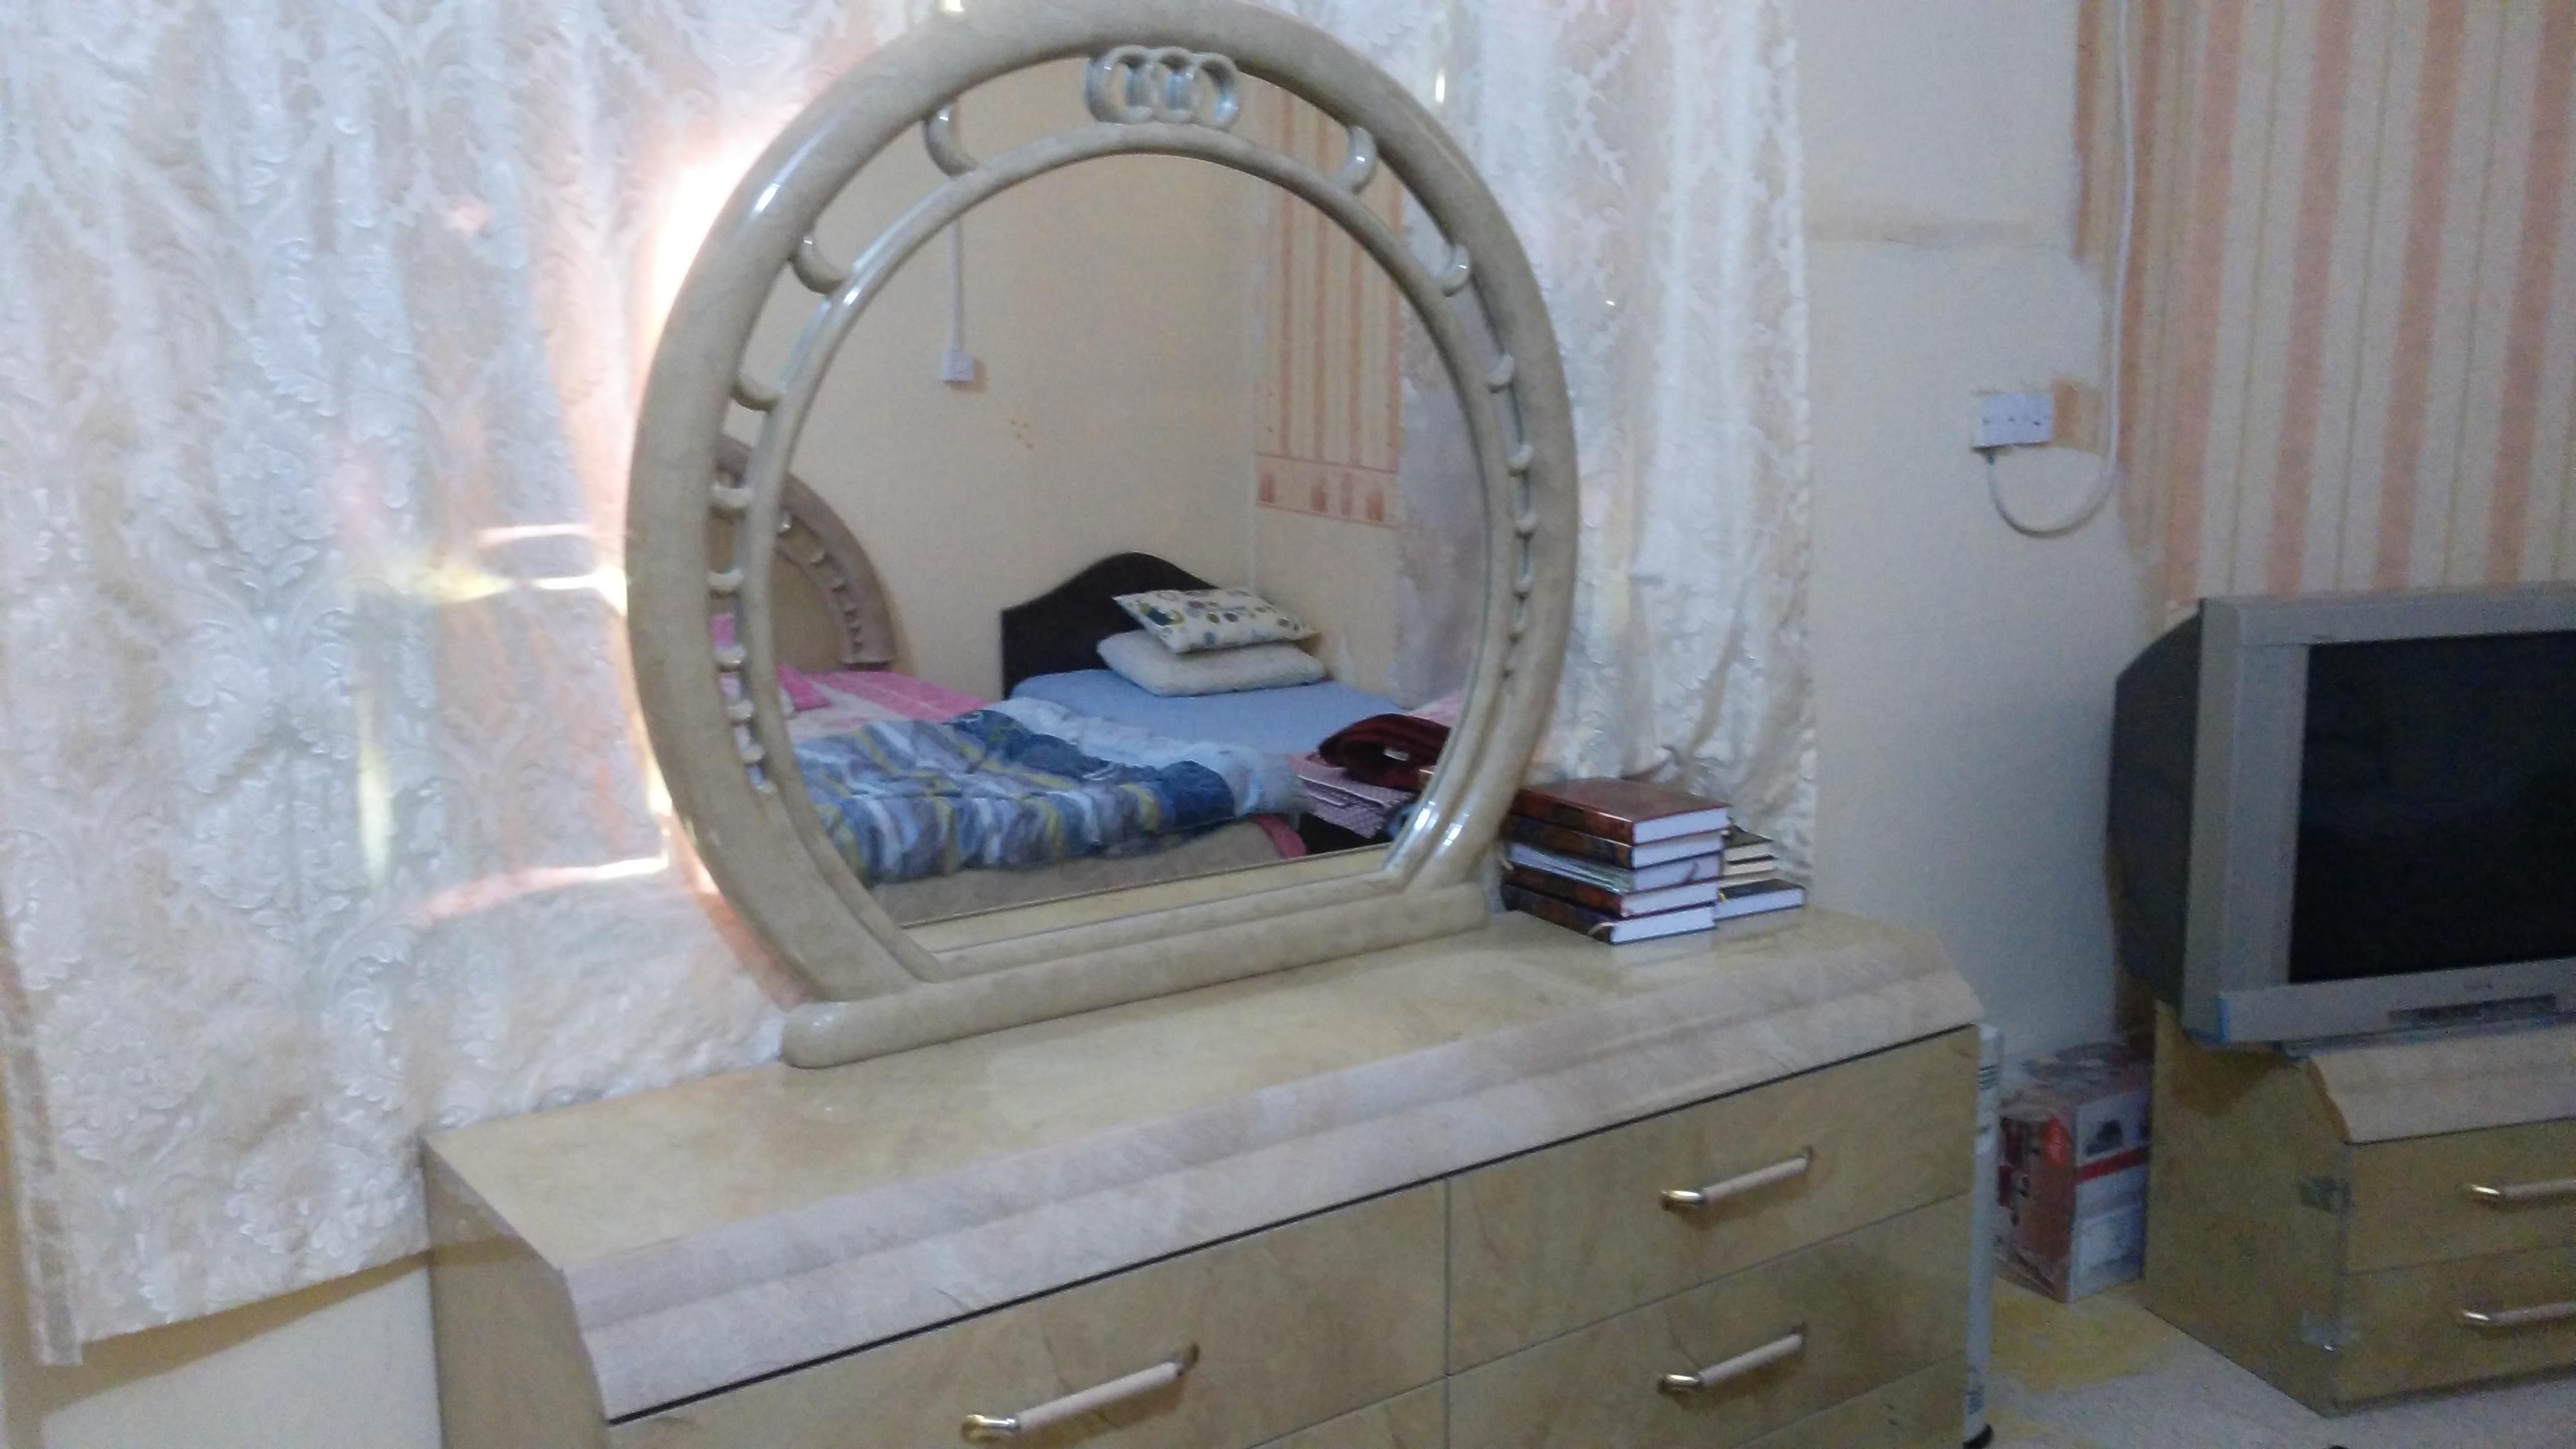 L sofa qatar living good qatar living nabco furniture for Sofa bed qatar living